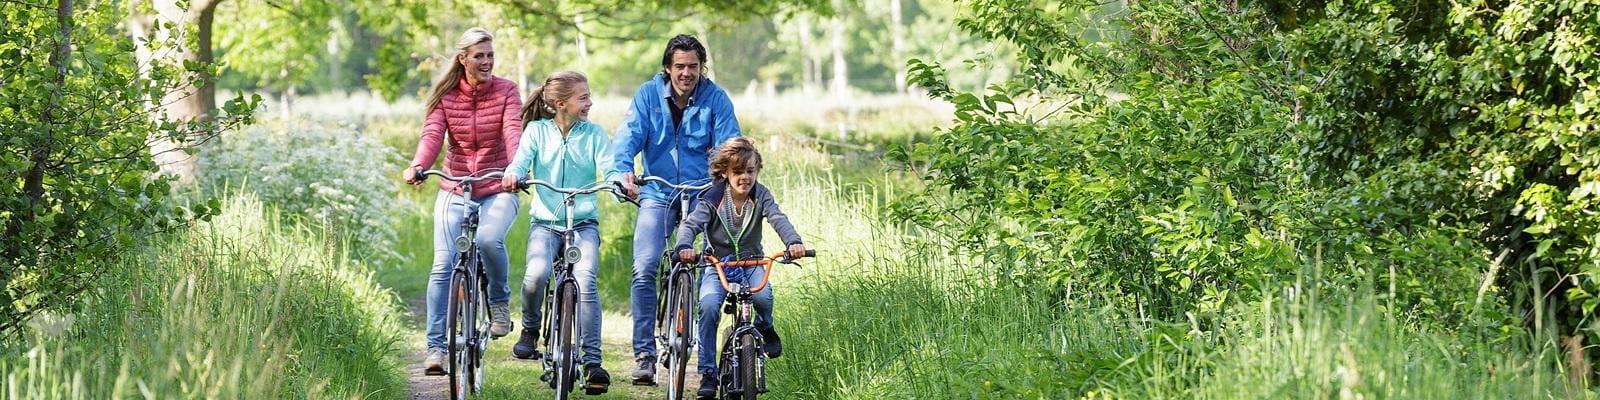 familie-55+korting fietsen